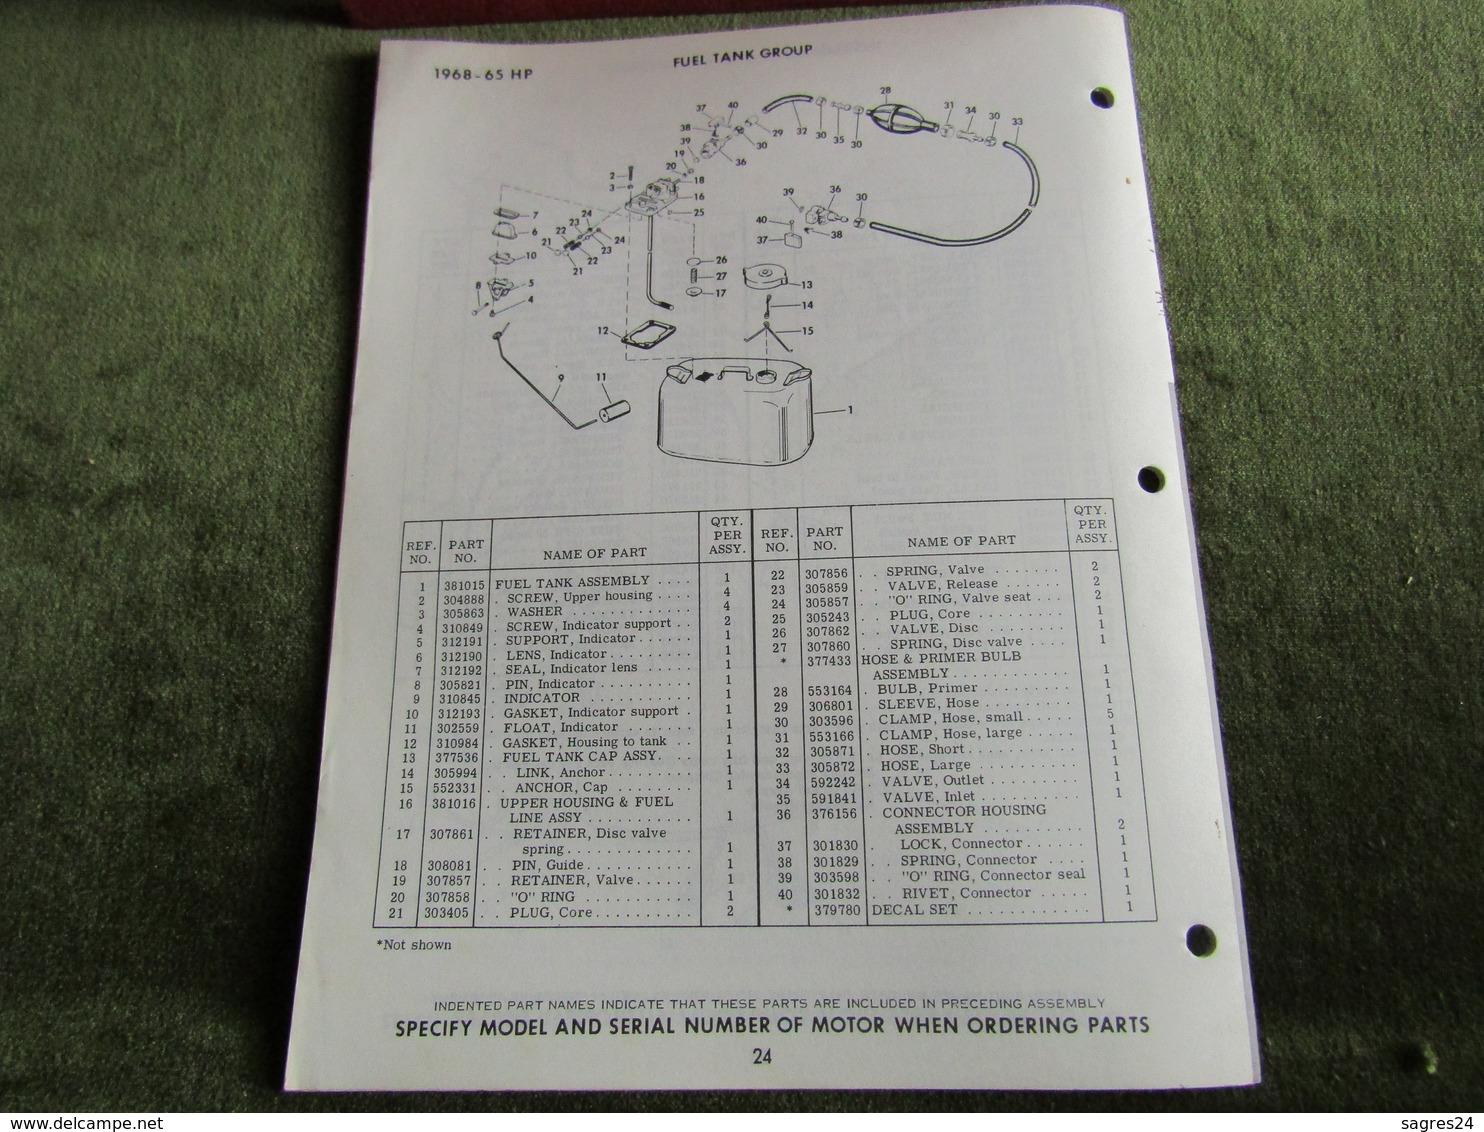 Evinrude Outboard 65 Sportfour Model S Parts Book 1968 - Boats